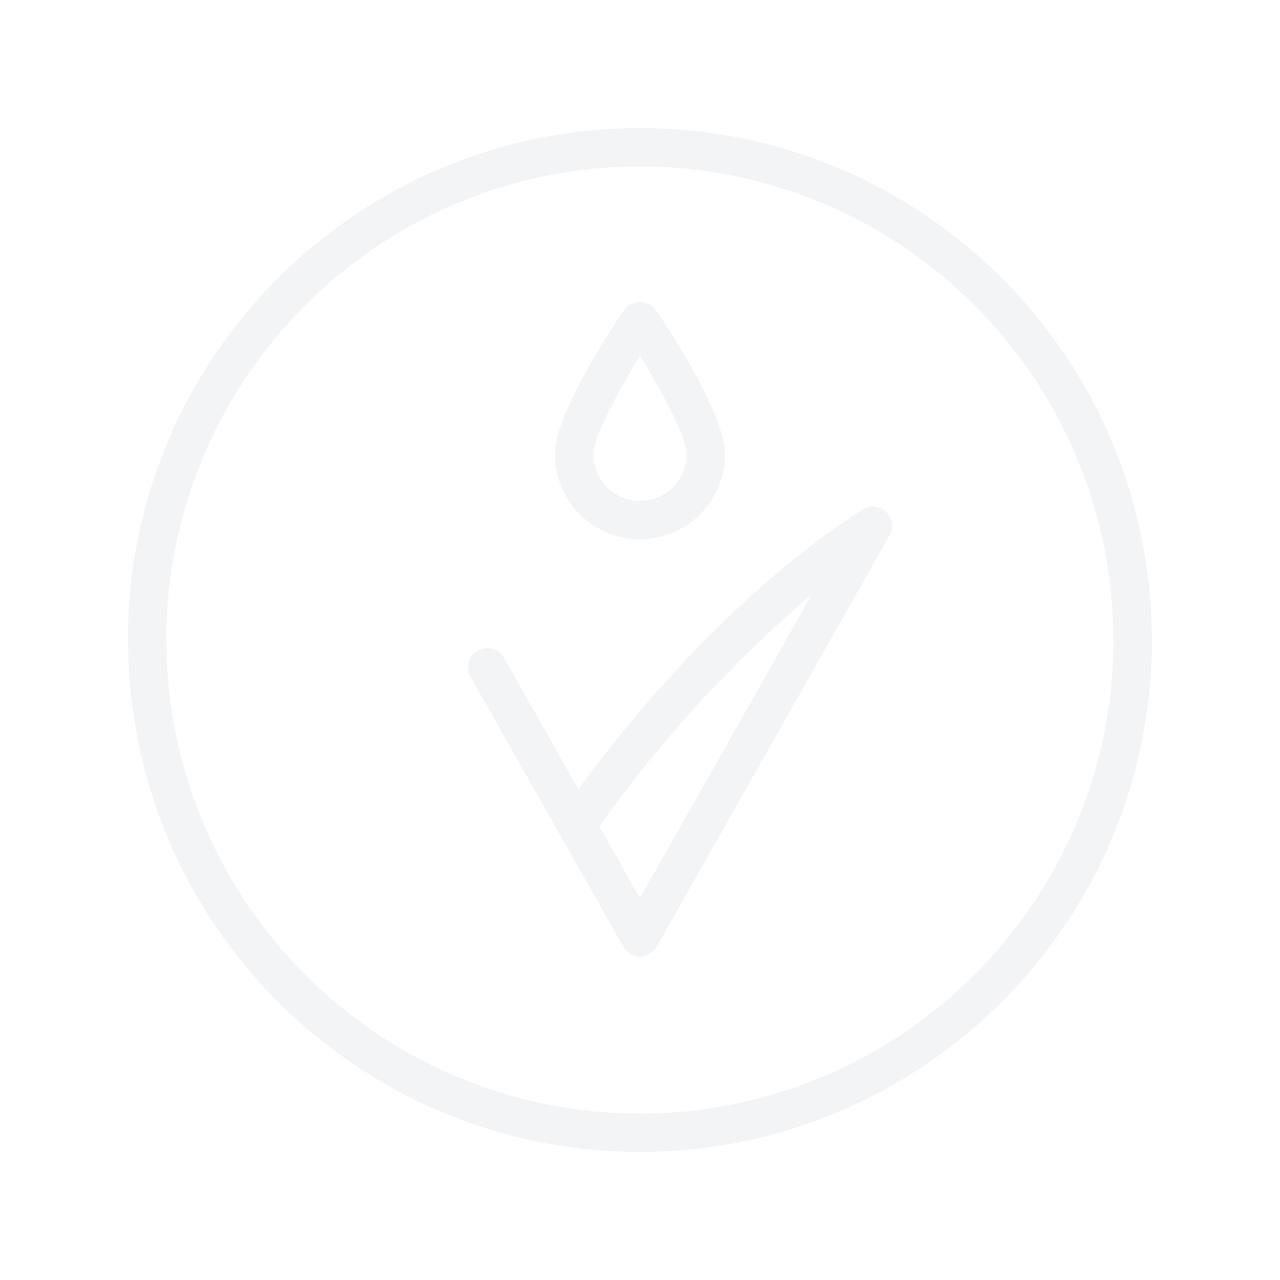 NATURA SIBERICA Kamchatka Cleansing Facial Cream 150ml